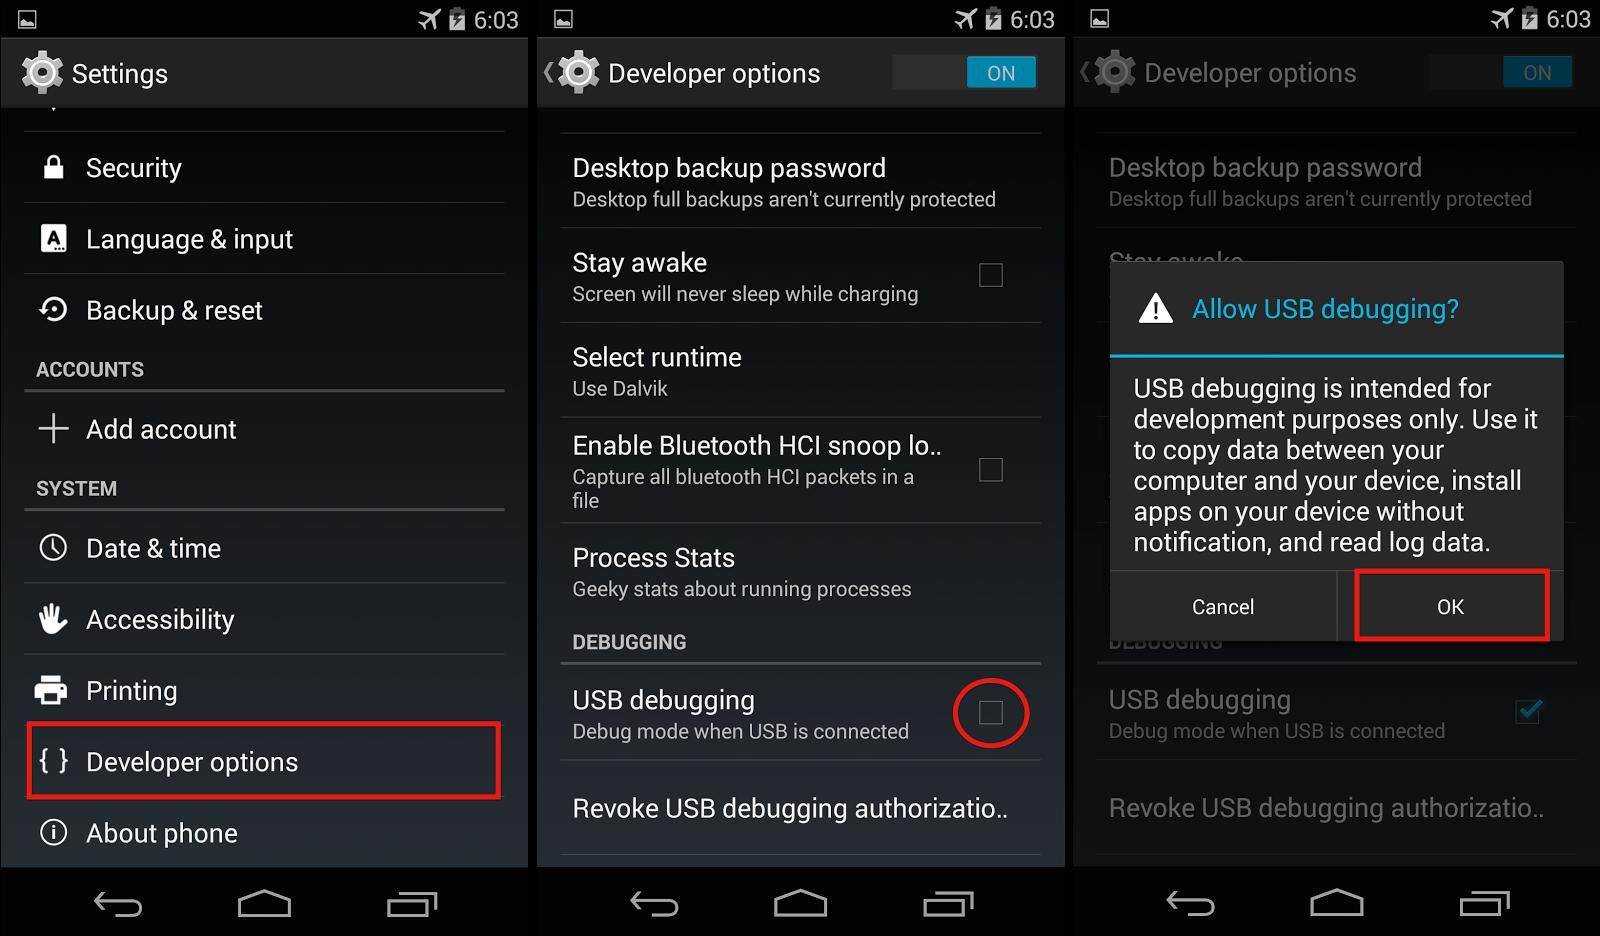 Nexus 5 dev options usb debugging